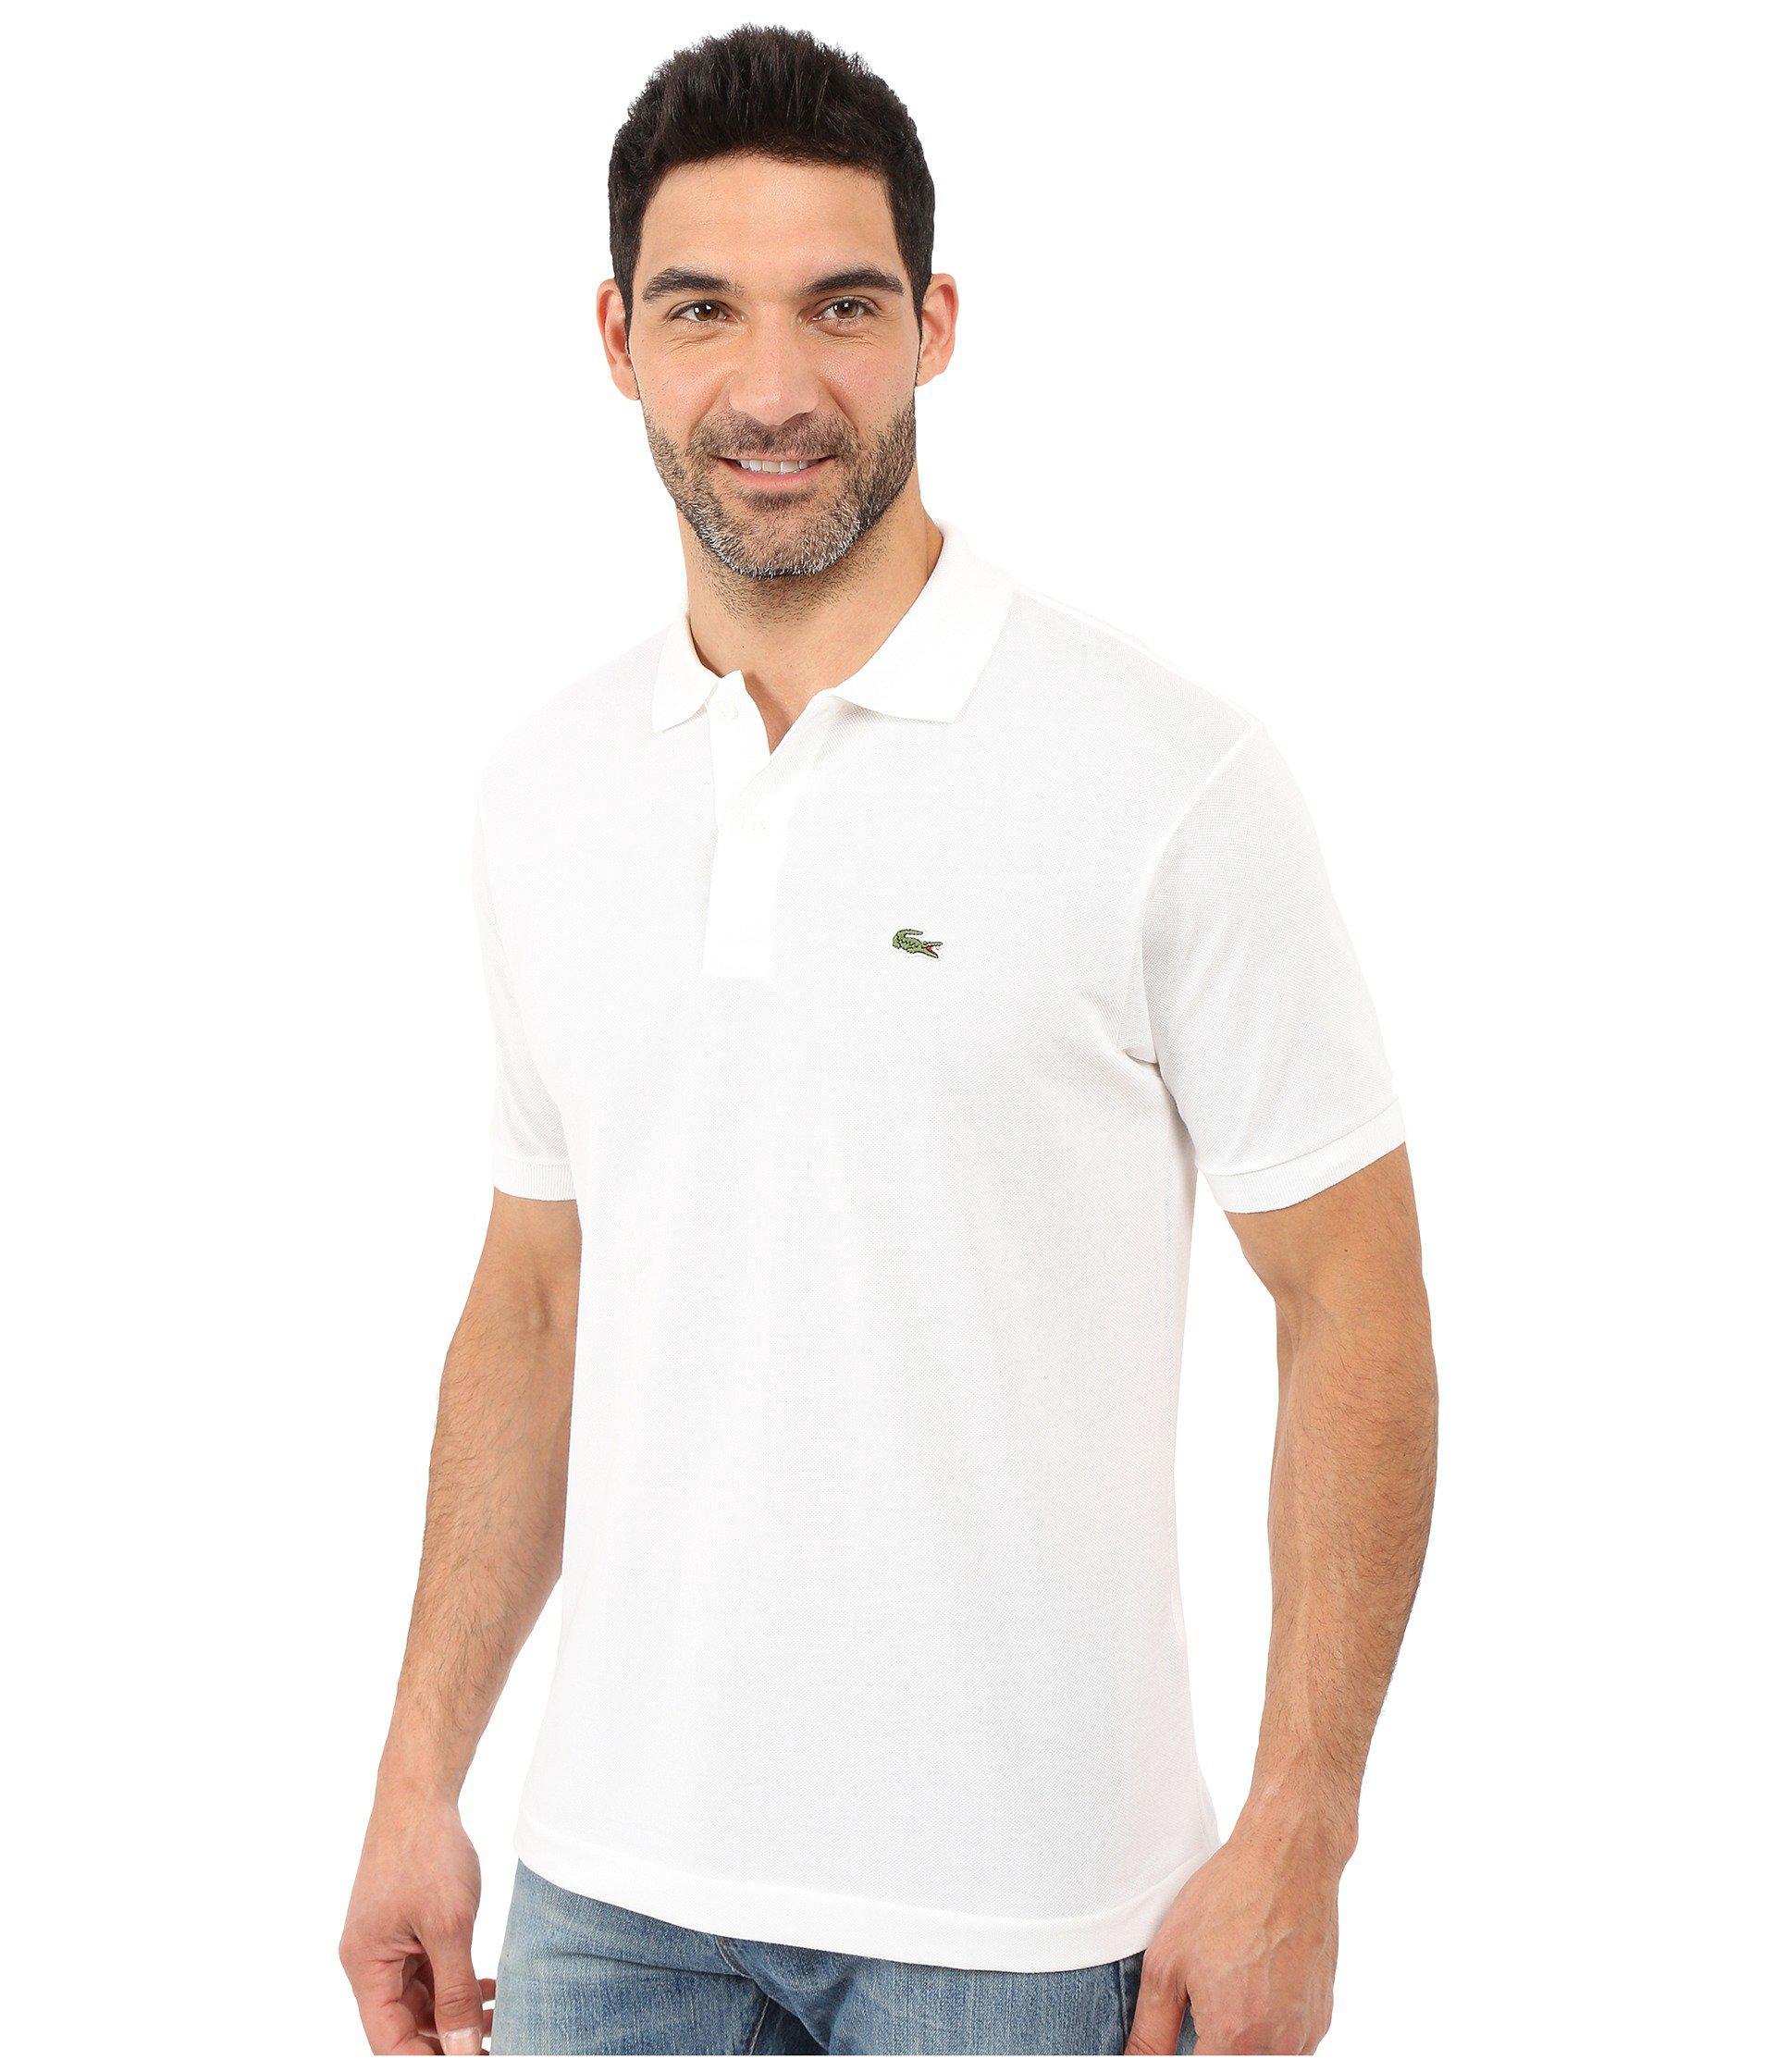 3e57474c8966 Lyst - Lacoste L1212 Classic Pique Polo Shirt (black) Men s Short Sleeve  Knit in White for Men